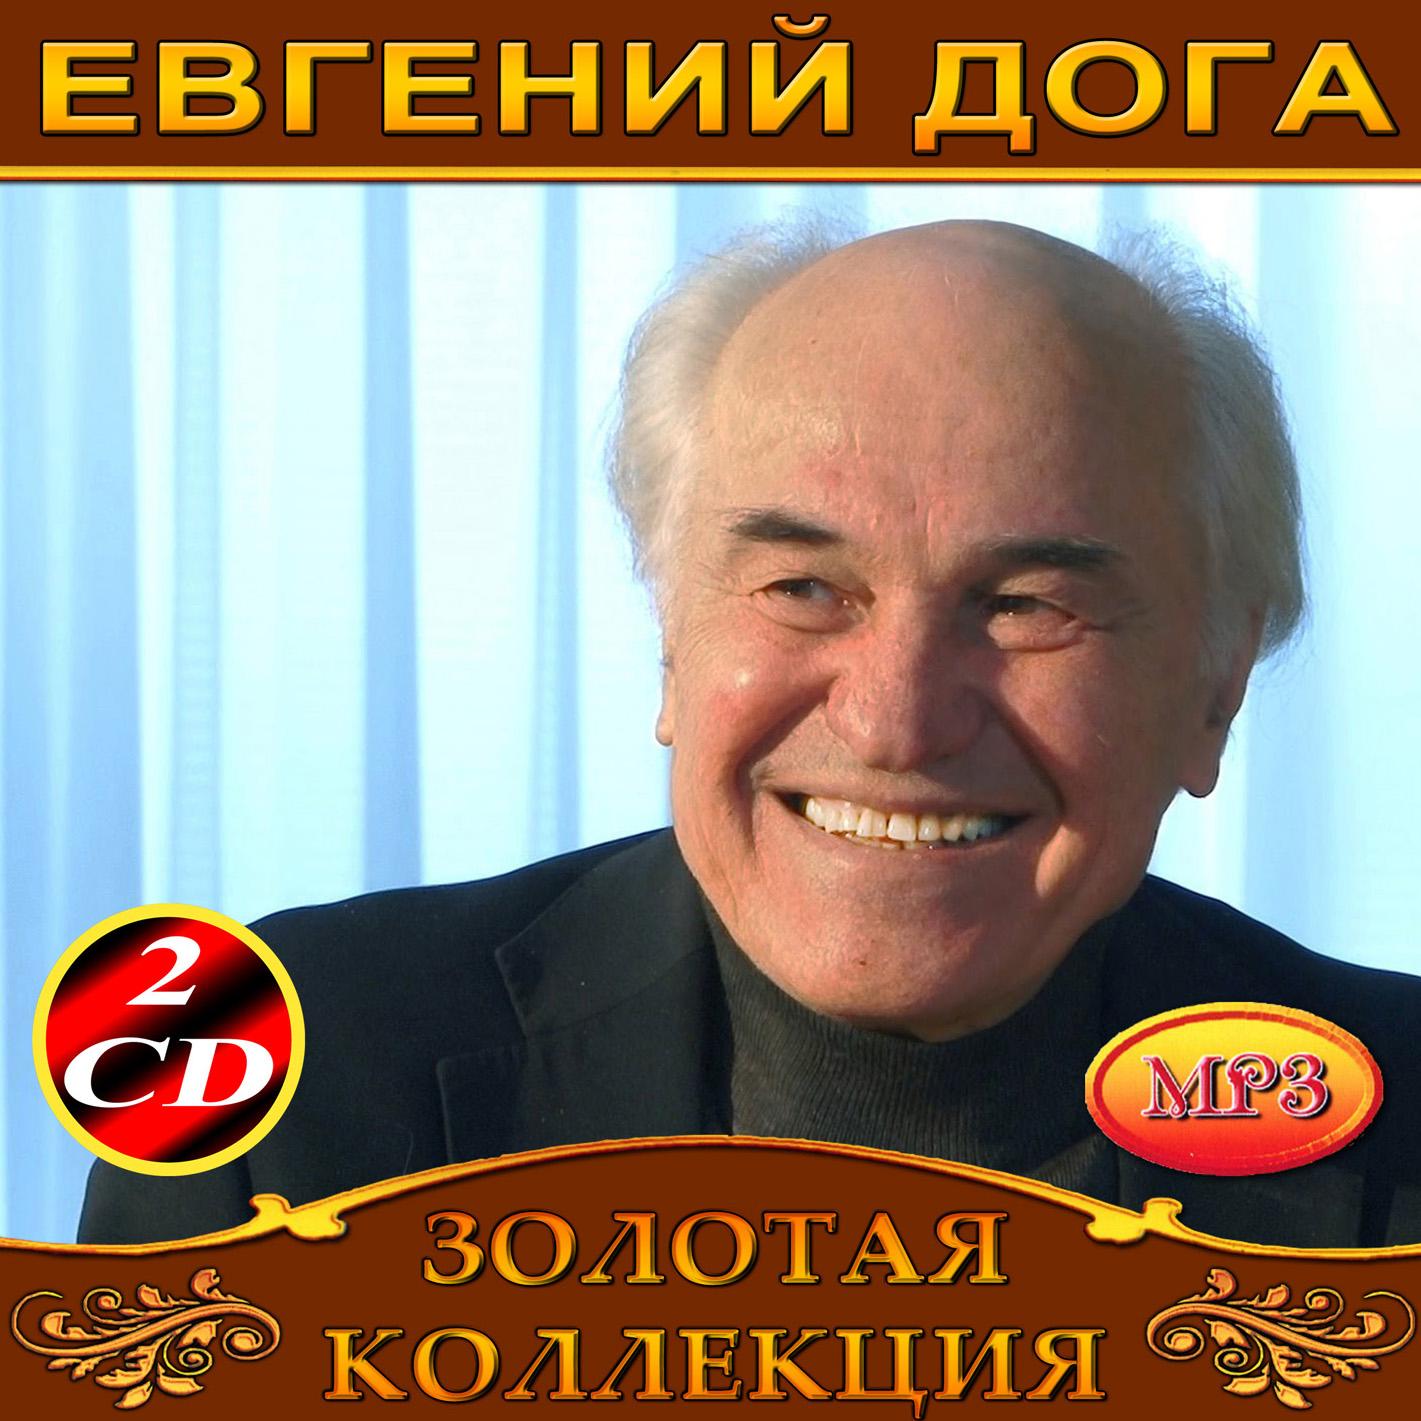 Евгений Дога 2cd [mp3]